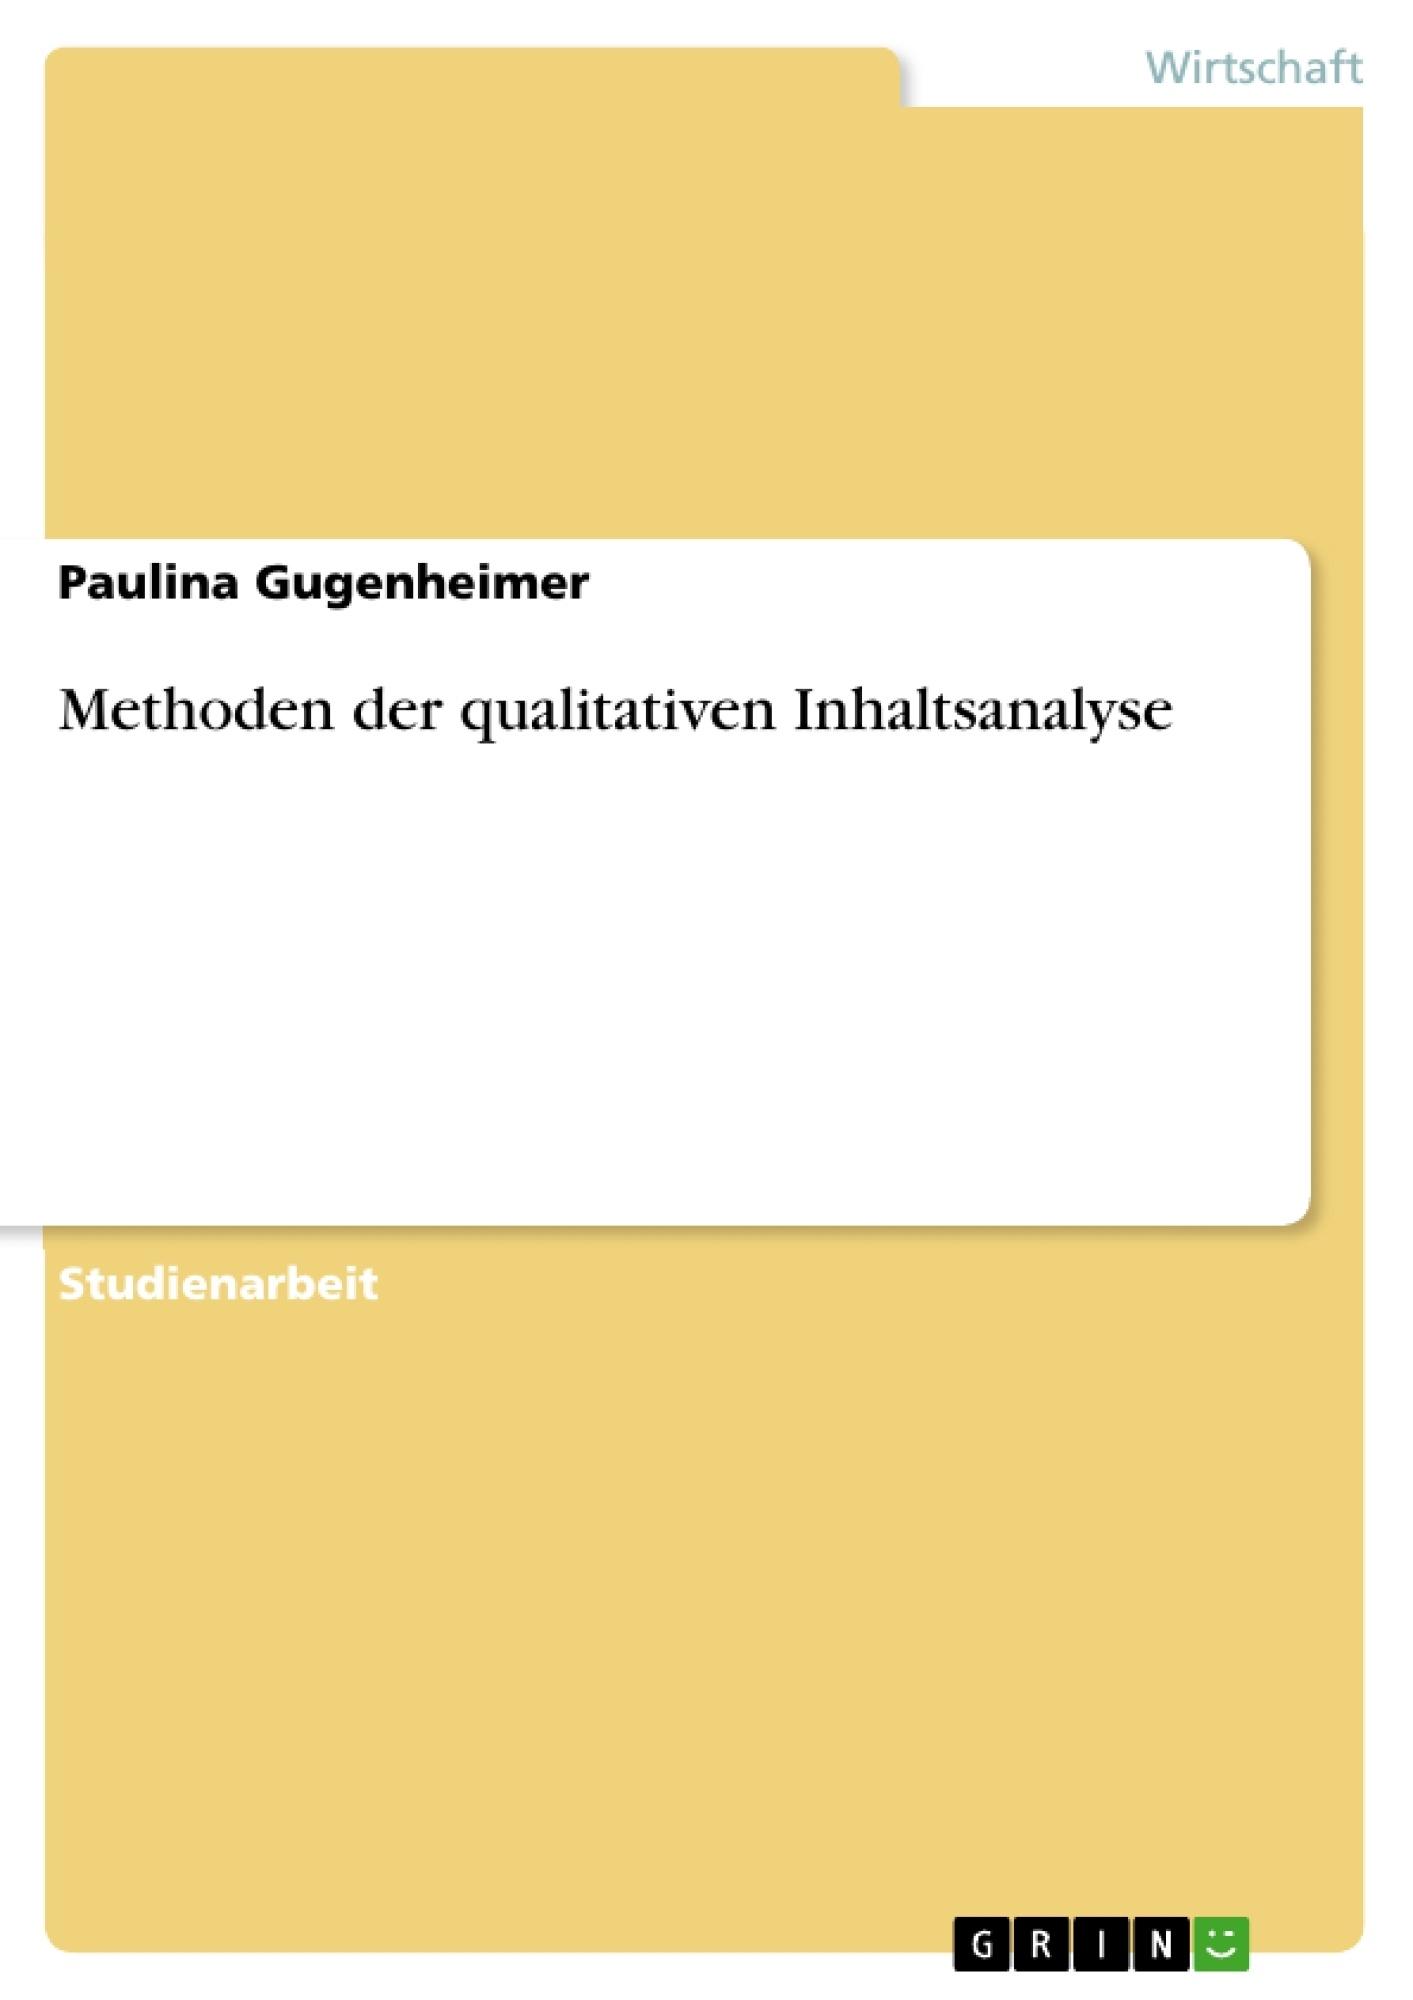 Hausarbeit qualitative inhaltsanalyse akadem tenoua